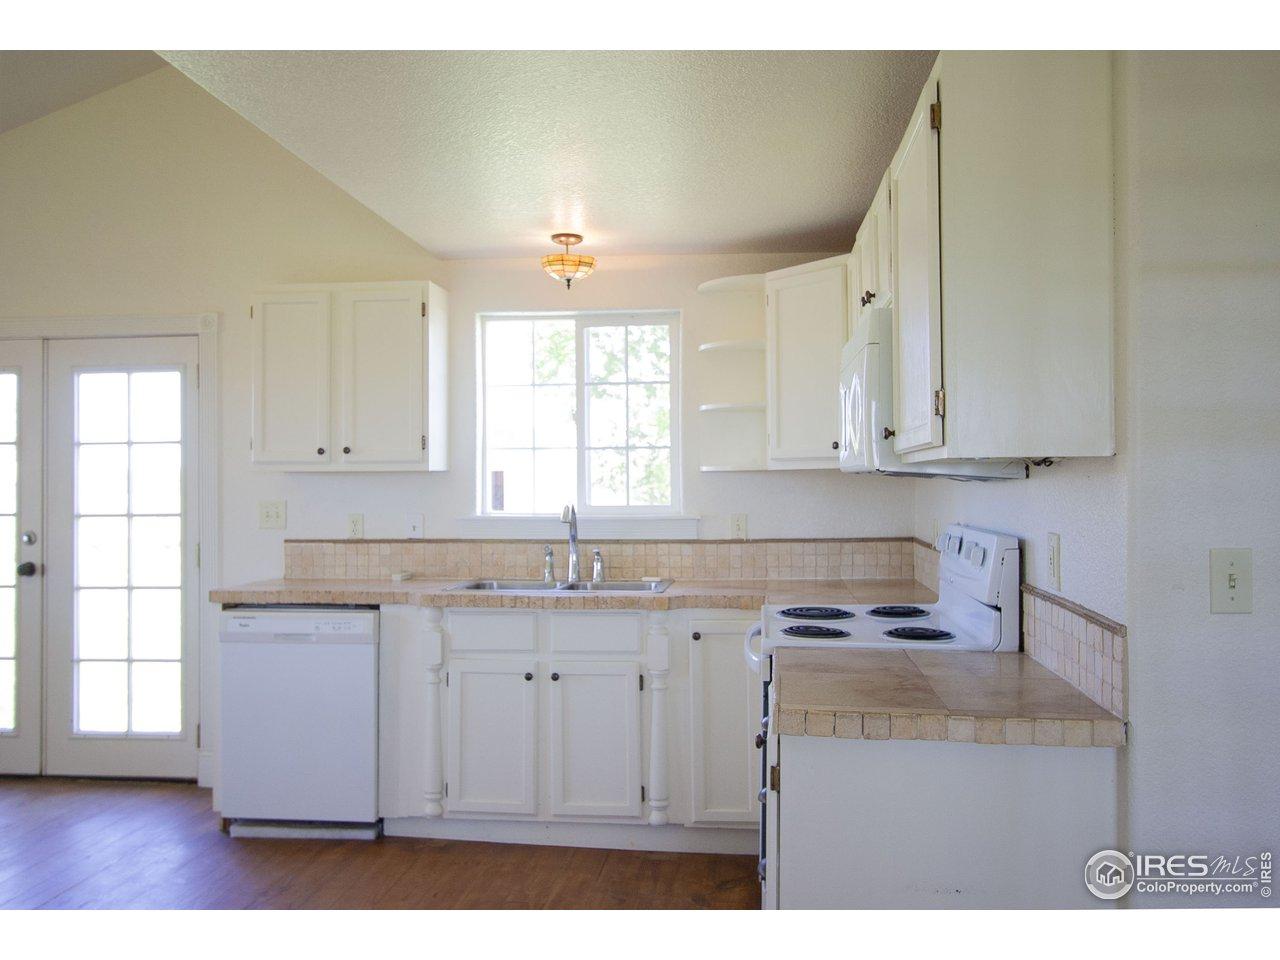 2nd house kitchen